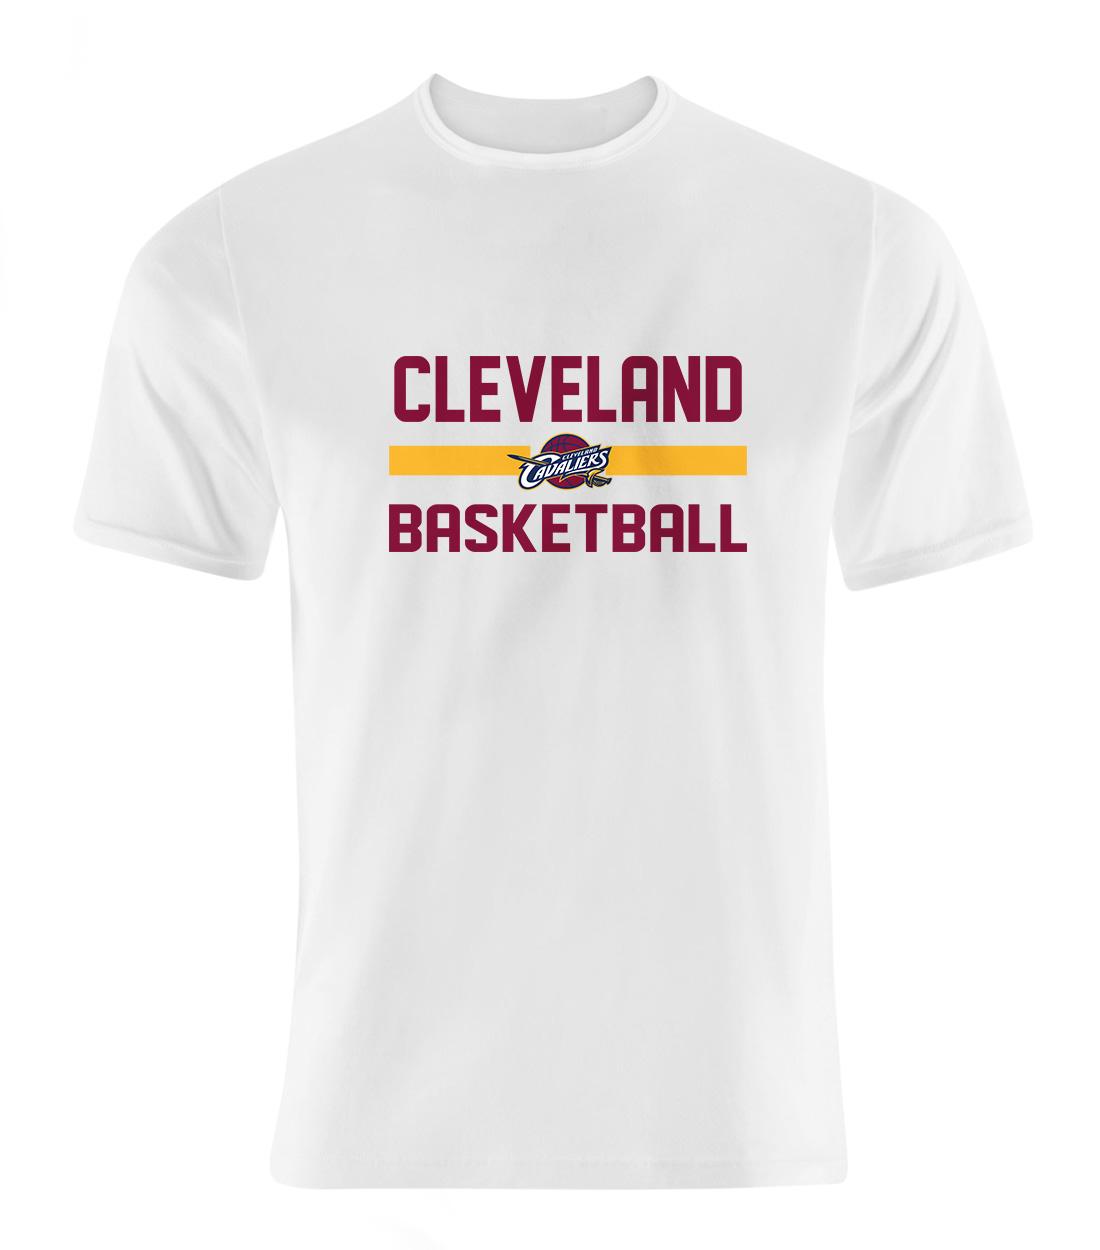 Cleveland Basketball Tshirt (TSH-WHT-SKR-clvlnd-bsktbll-506)